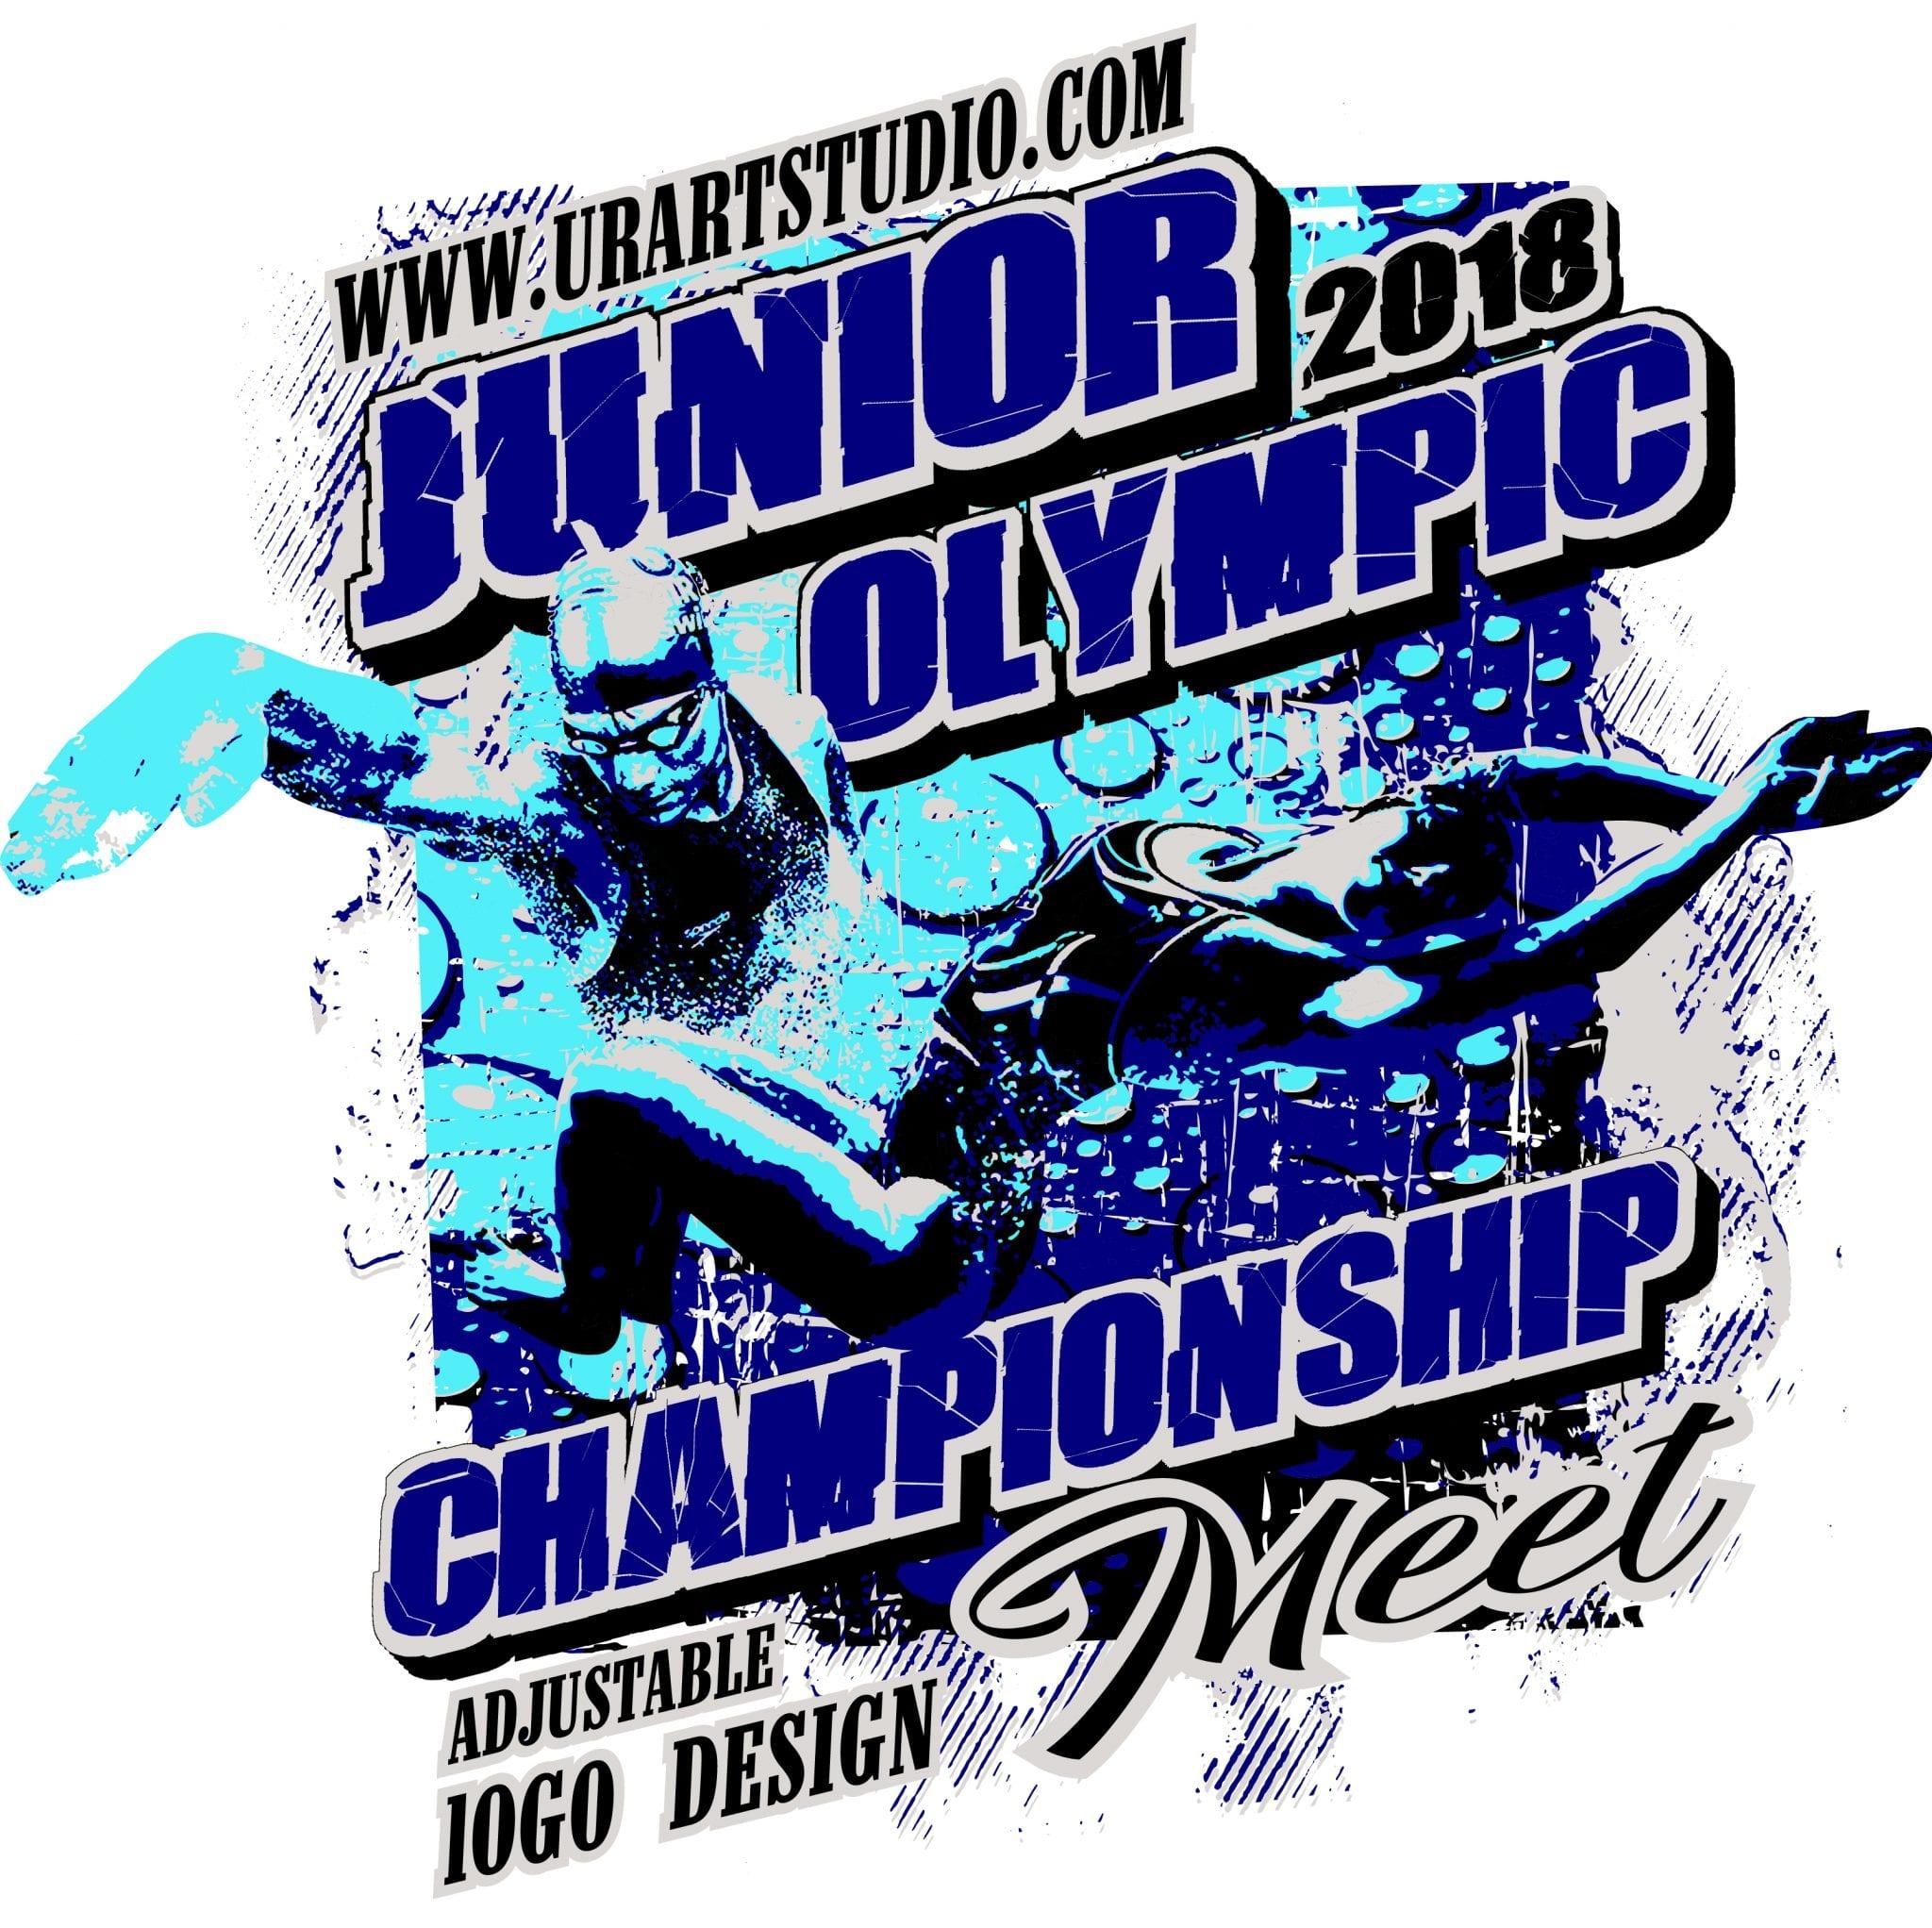 Swimming Junior Olympic Championship Meet 2018 T Shirt